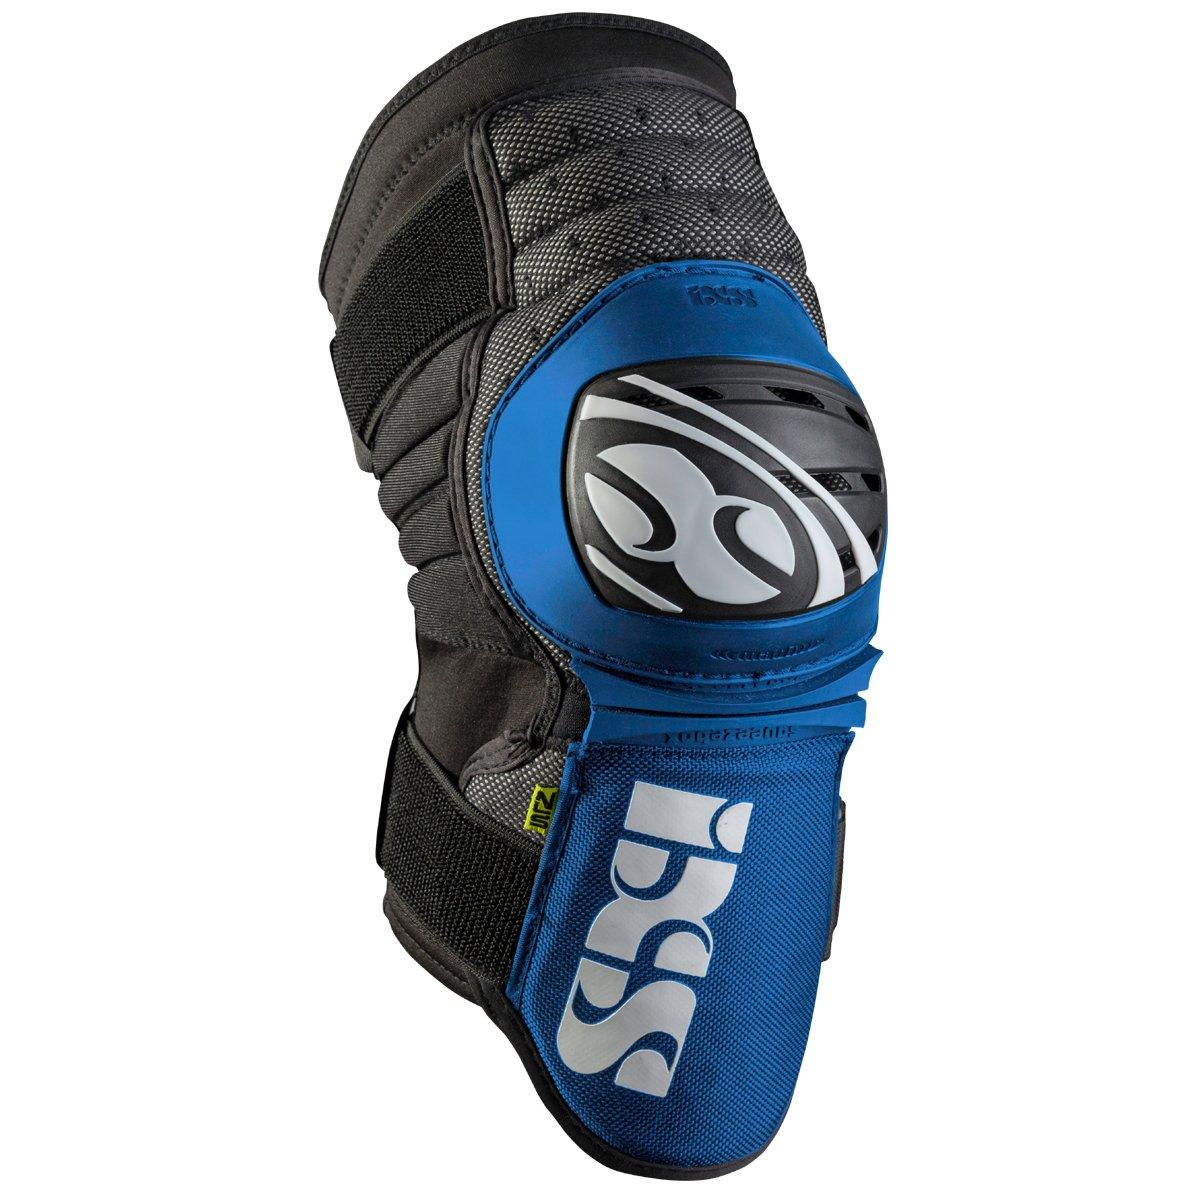 IXS Dagger Knee/Shin Guard - 482-510-3605 (Blue (D'Claw) - XL) by IXS